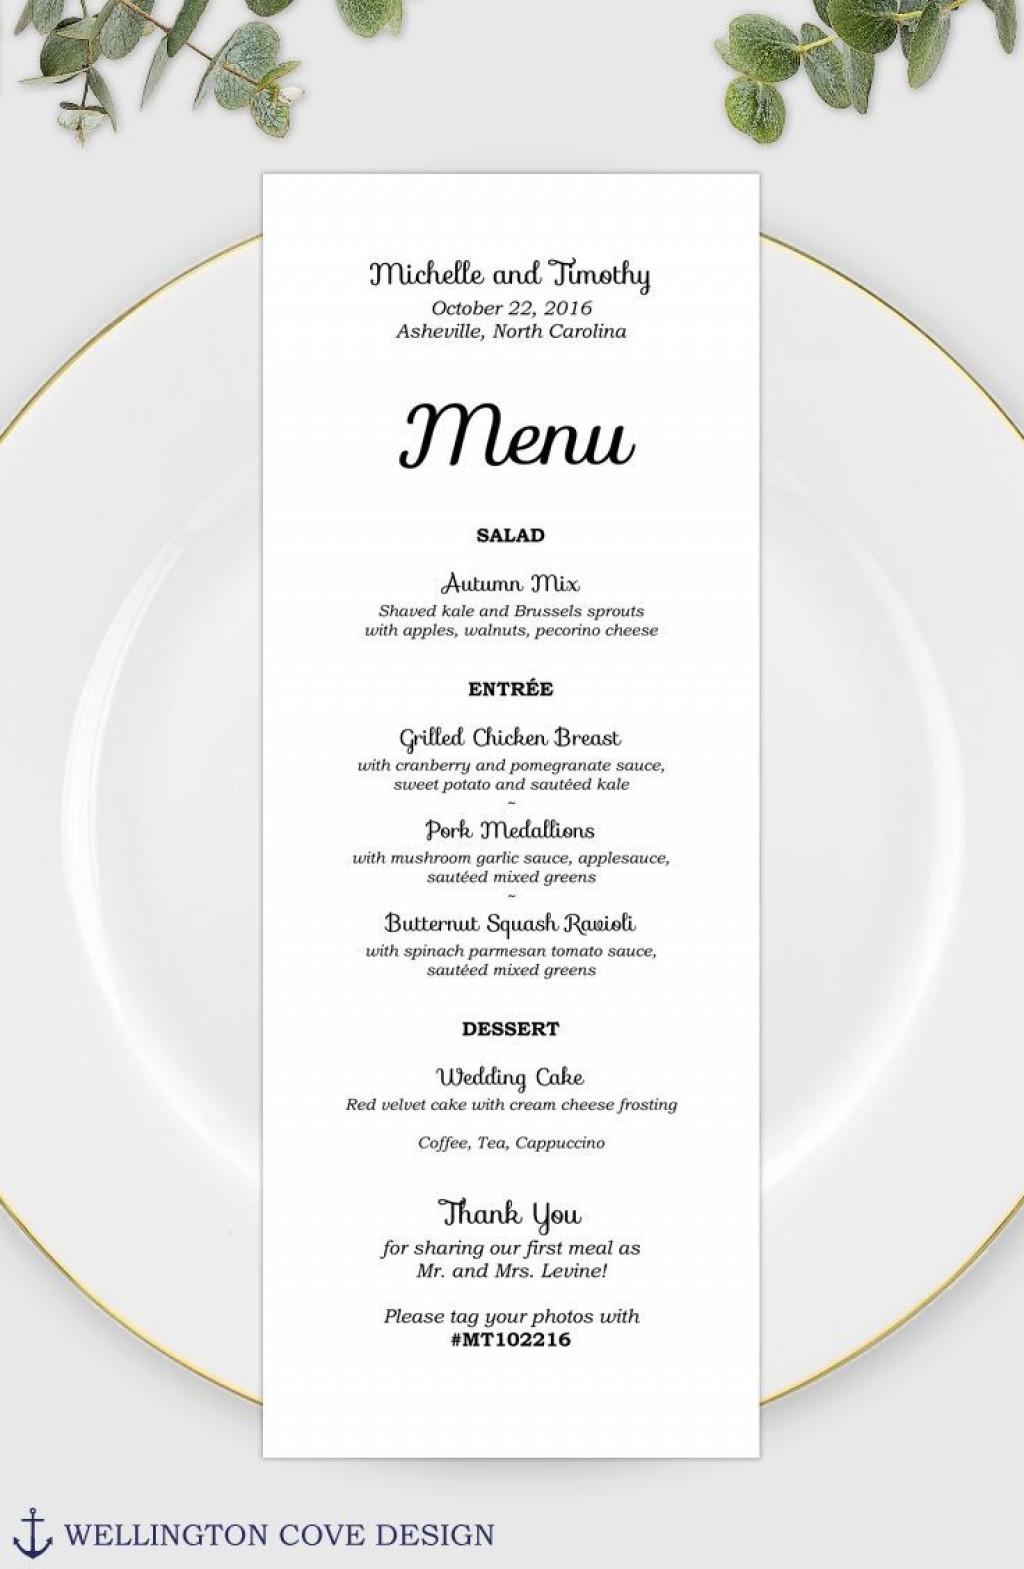 004 Stunning Wedding Menu Card Template Word Example Large